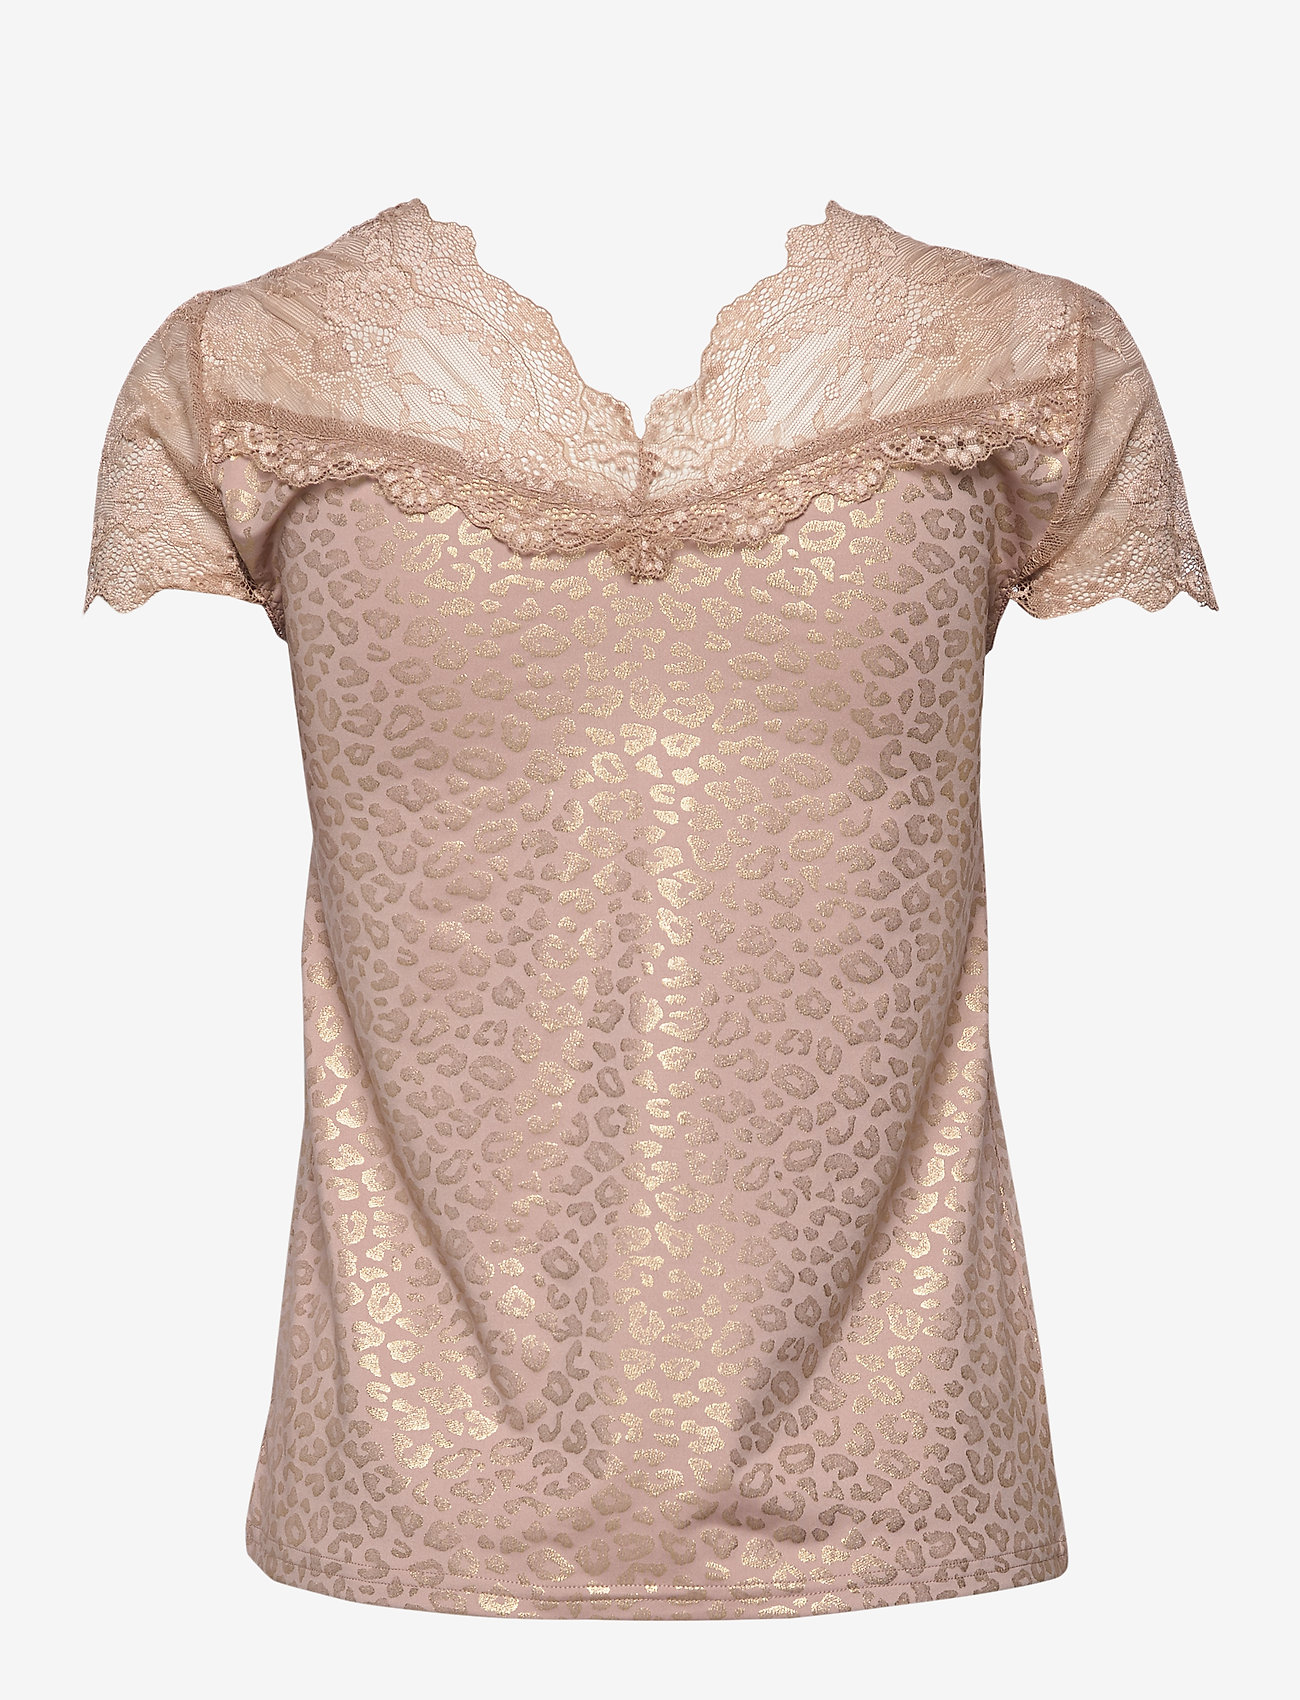 Rosemunde T-shirt ss - Blouses & Shirts VINTAGE LEOPARD GOLD FOIL PRINT